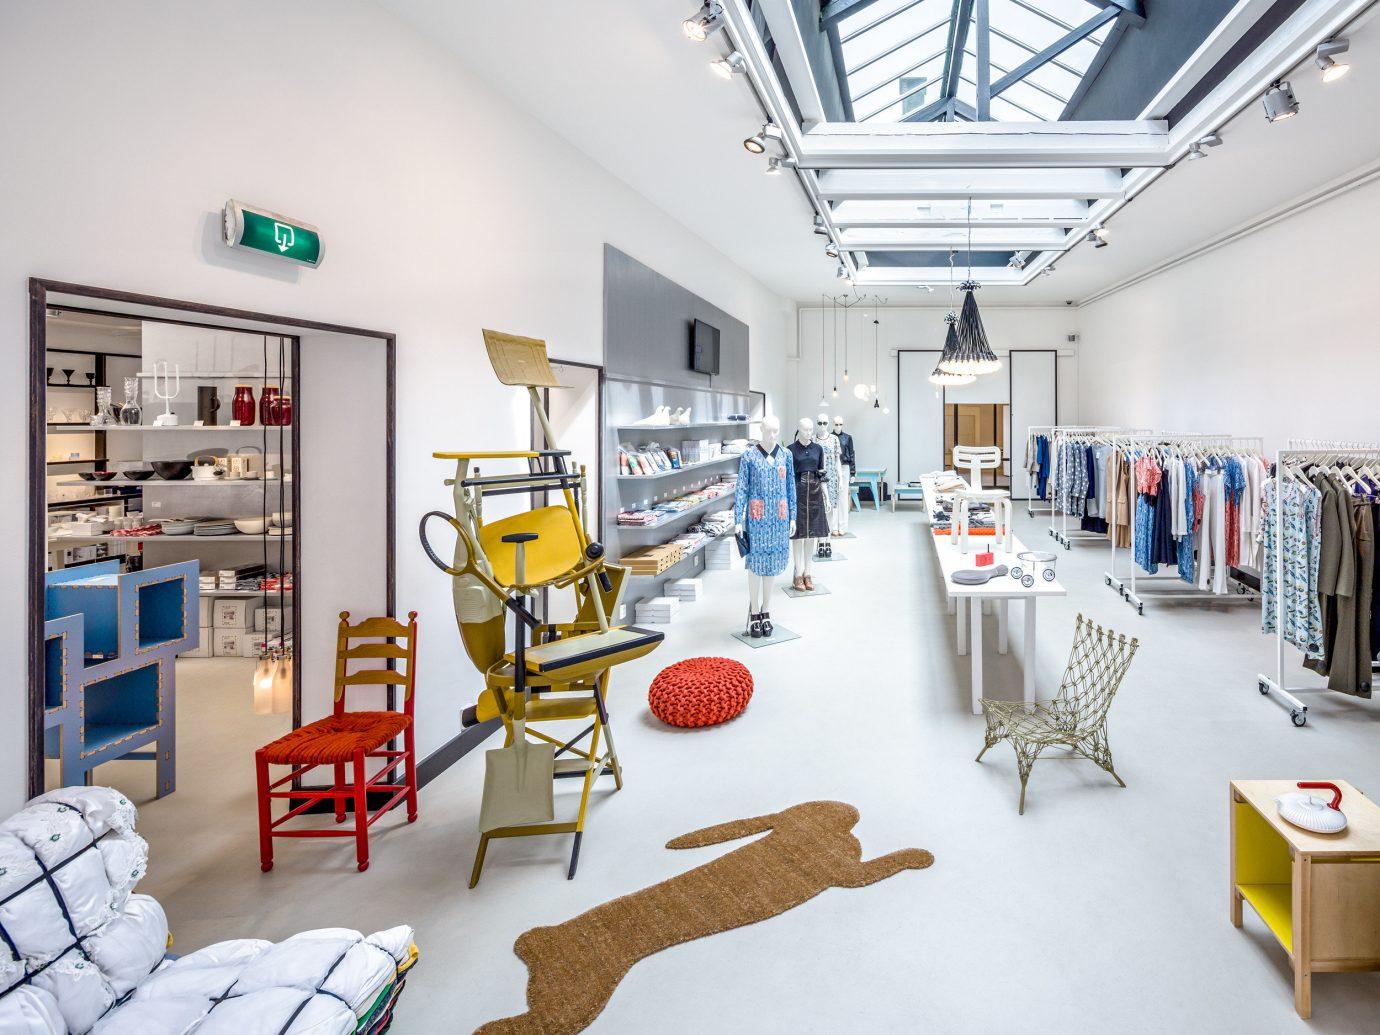 shopping Style + Design Travel Trends Trip Ideas indoor interior design loft retail several